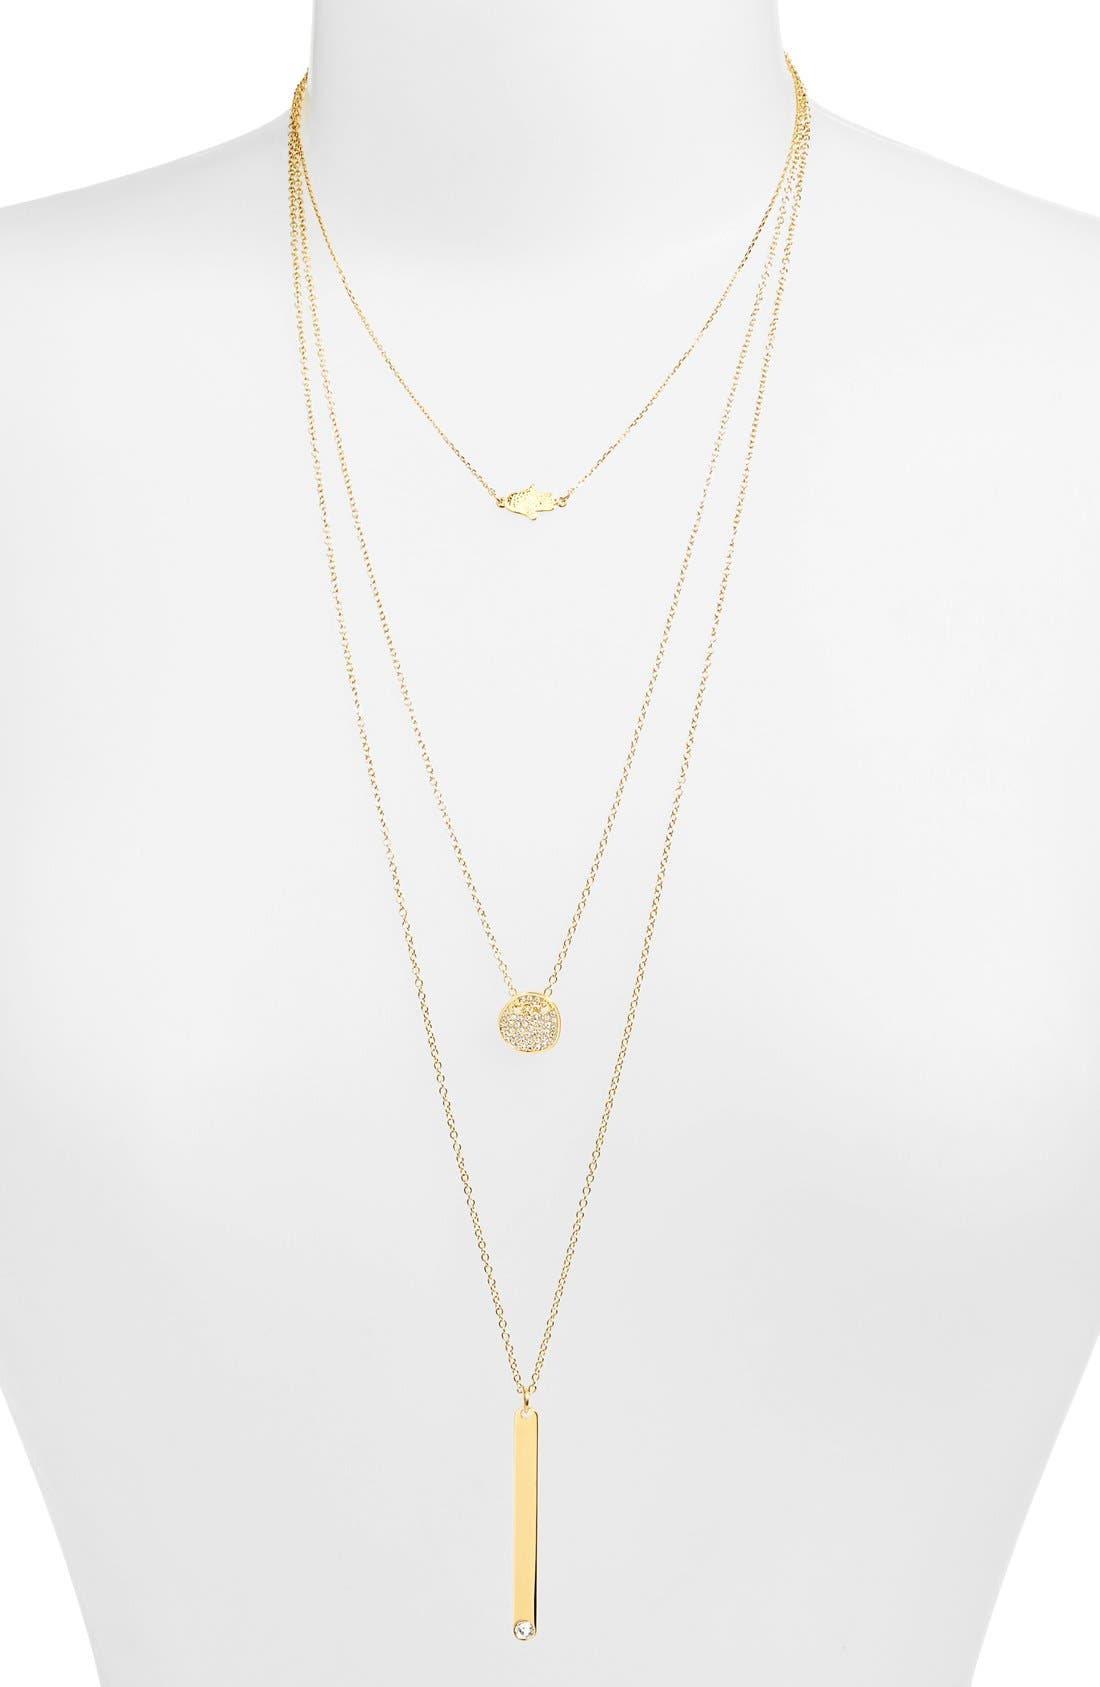 Alternate Image 1 Selected - BaubleBar 'Modern Metallics' 14k-Gold Plate Layered Necklace (Set of 3) (Nordstrom Exclusive)